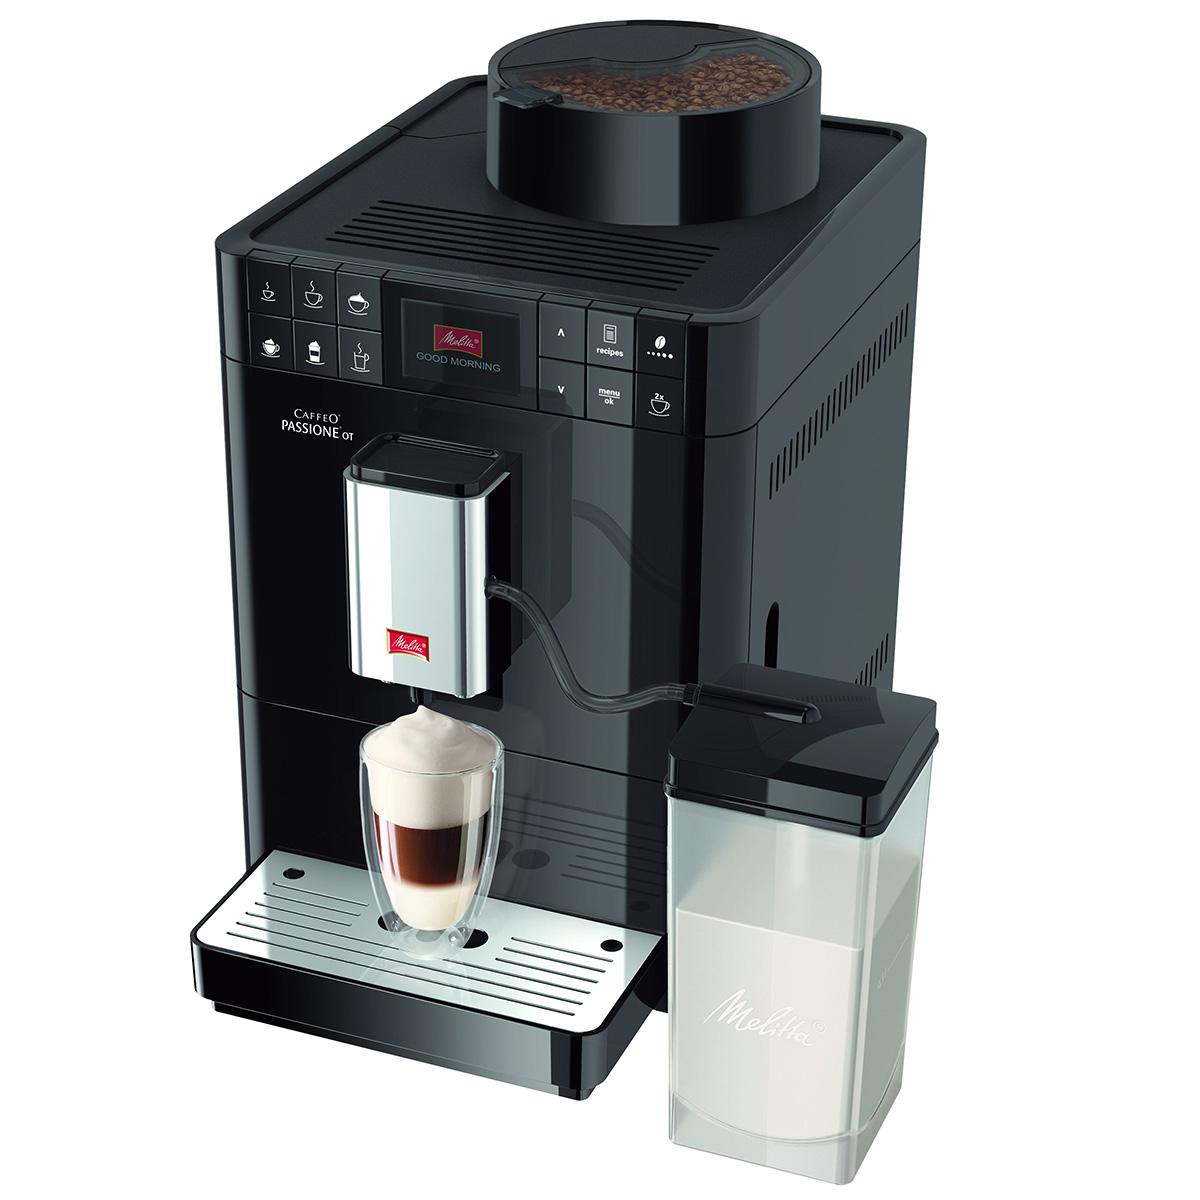 Melitta espressomaskine - Caffeo Passione OT - Sort